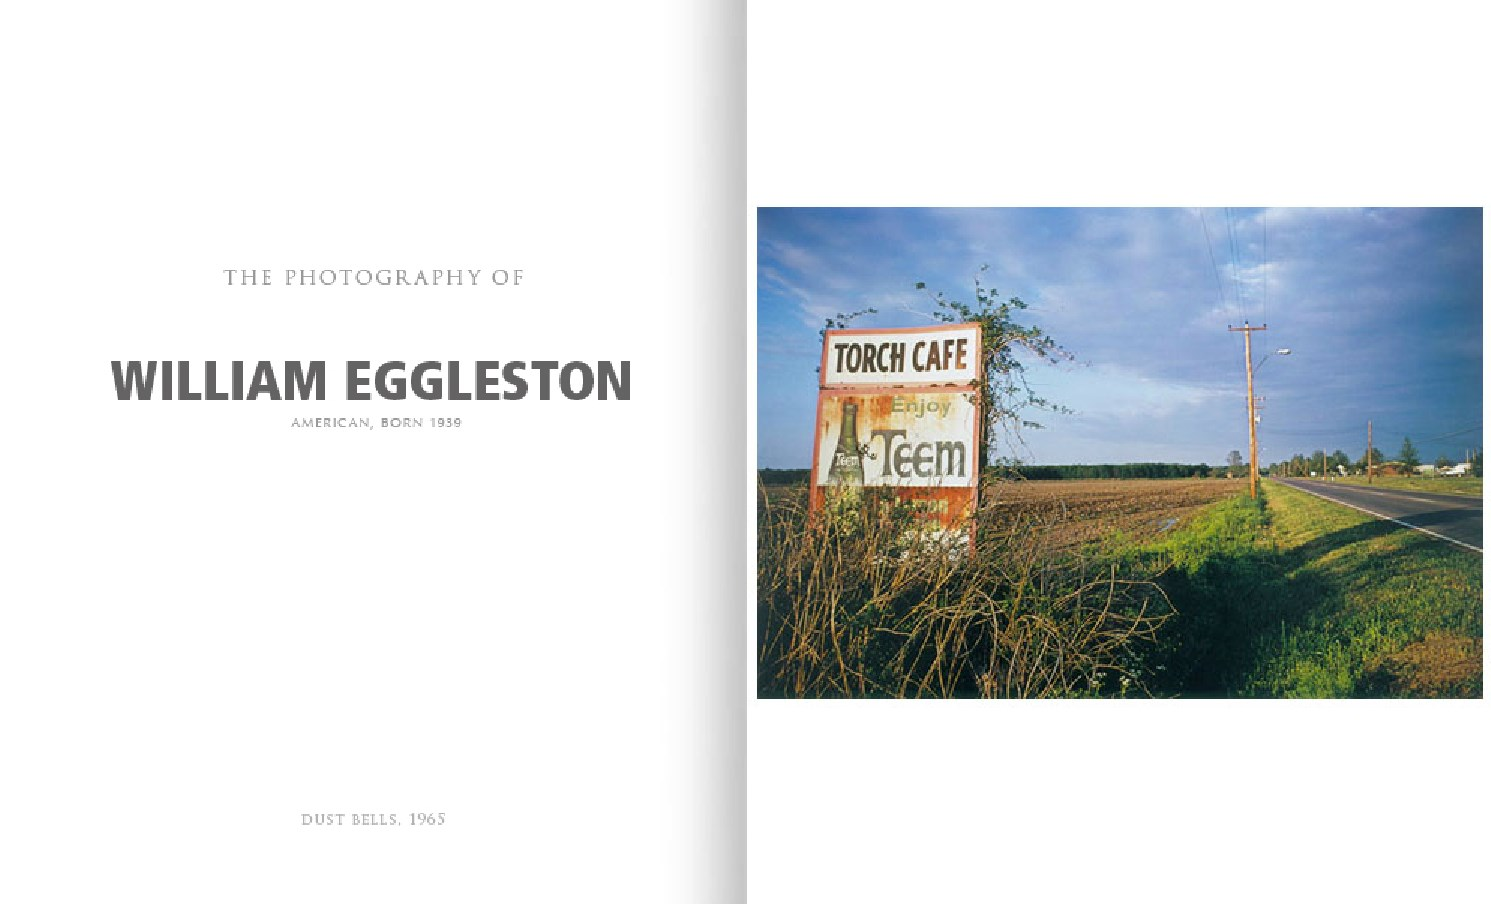 eggleston.jpg